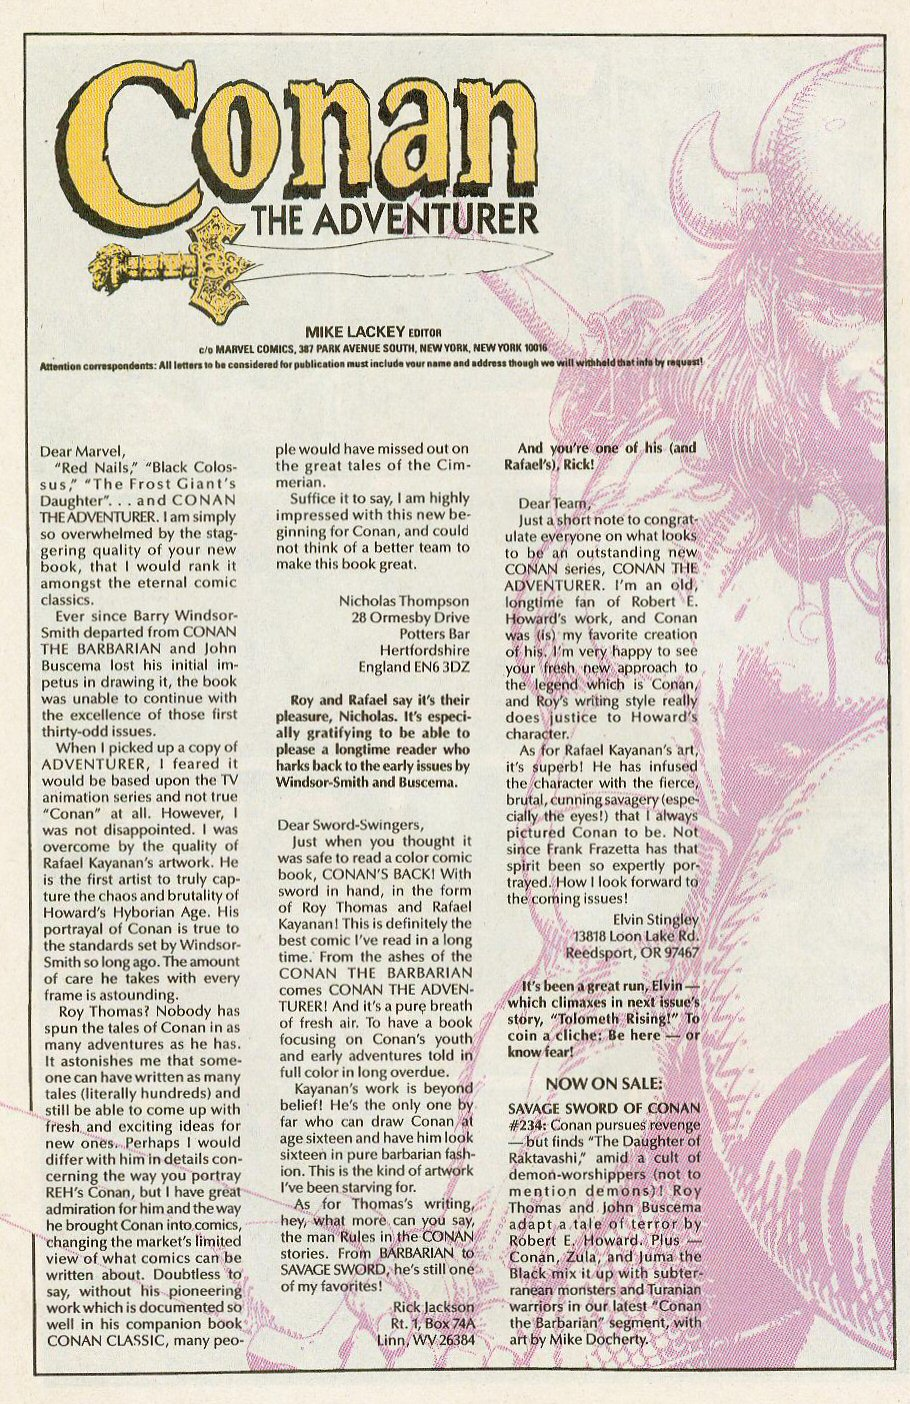 Read online Conan the Adventurer comic -  Issue #13 - 26